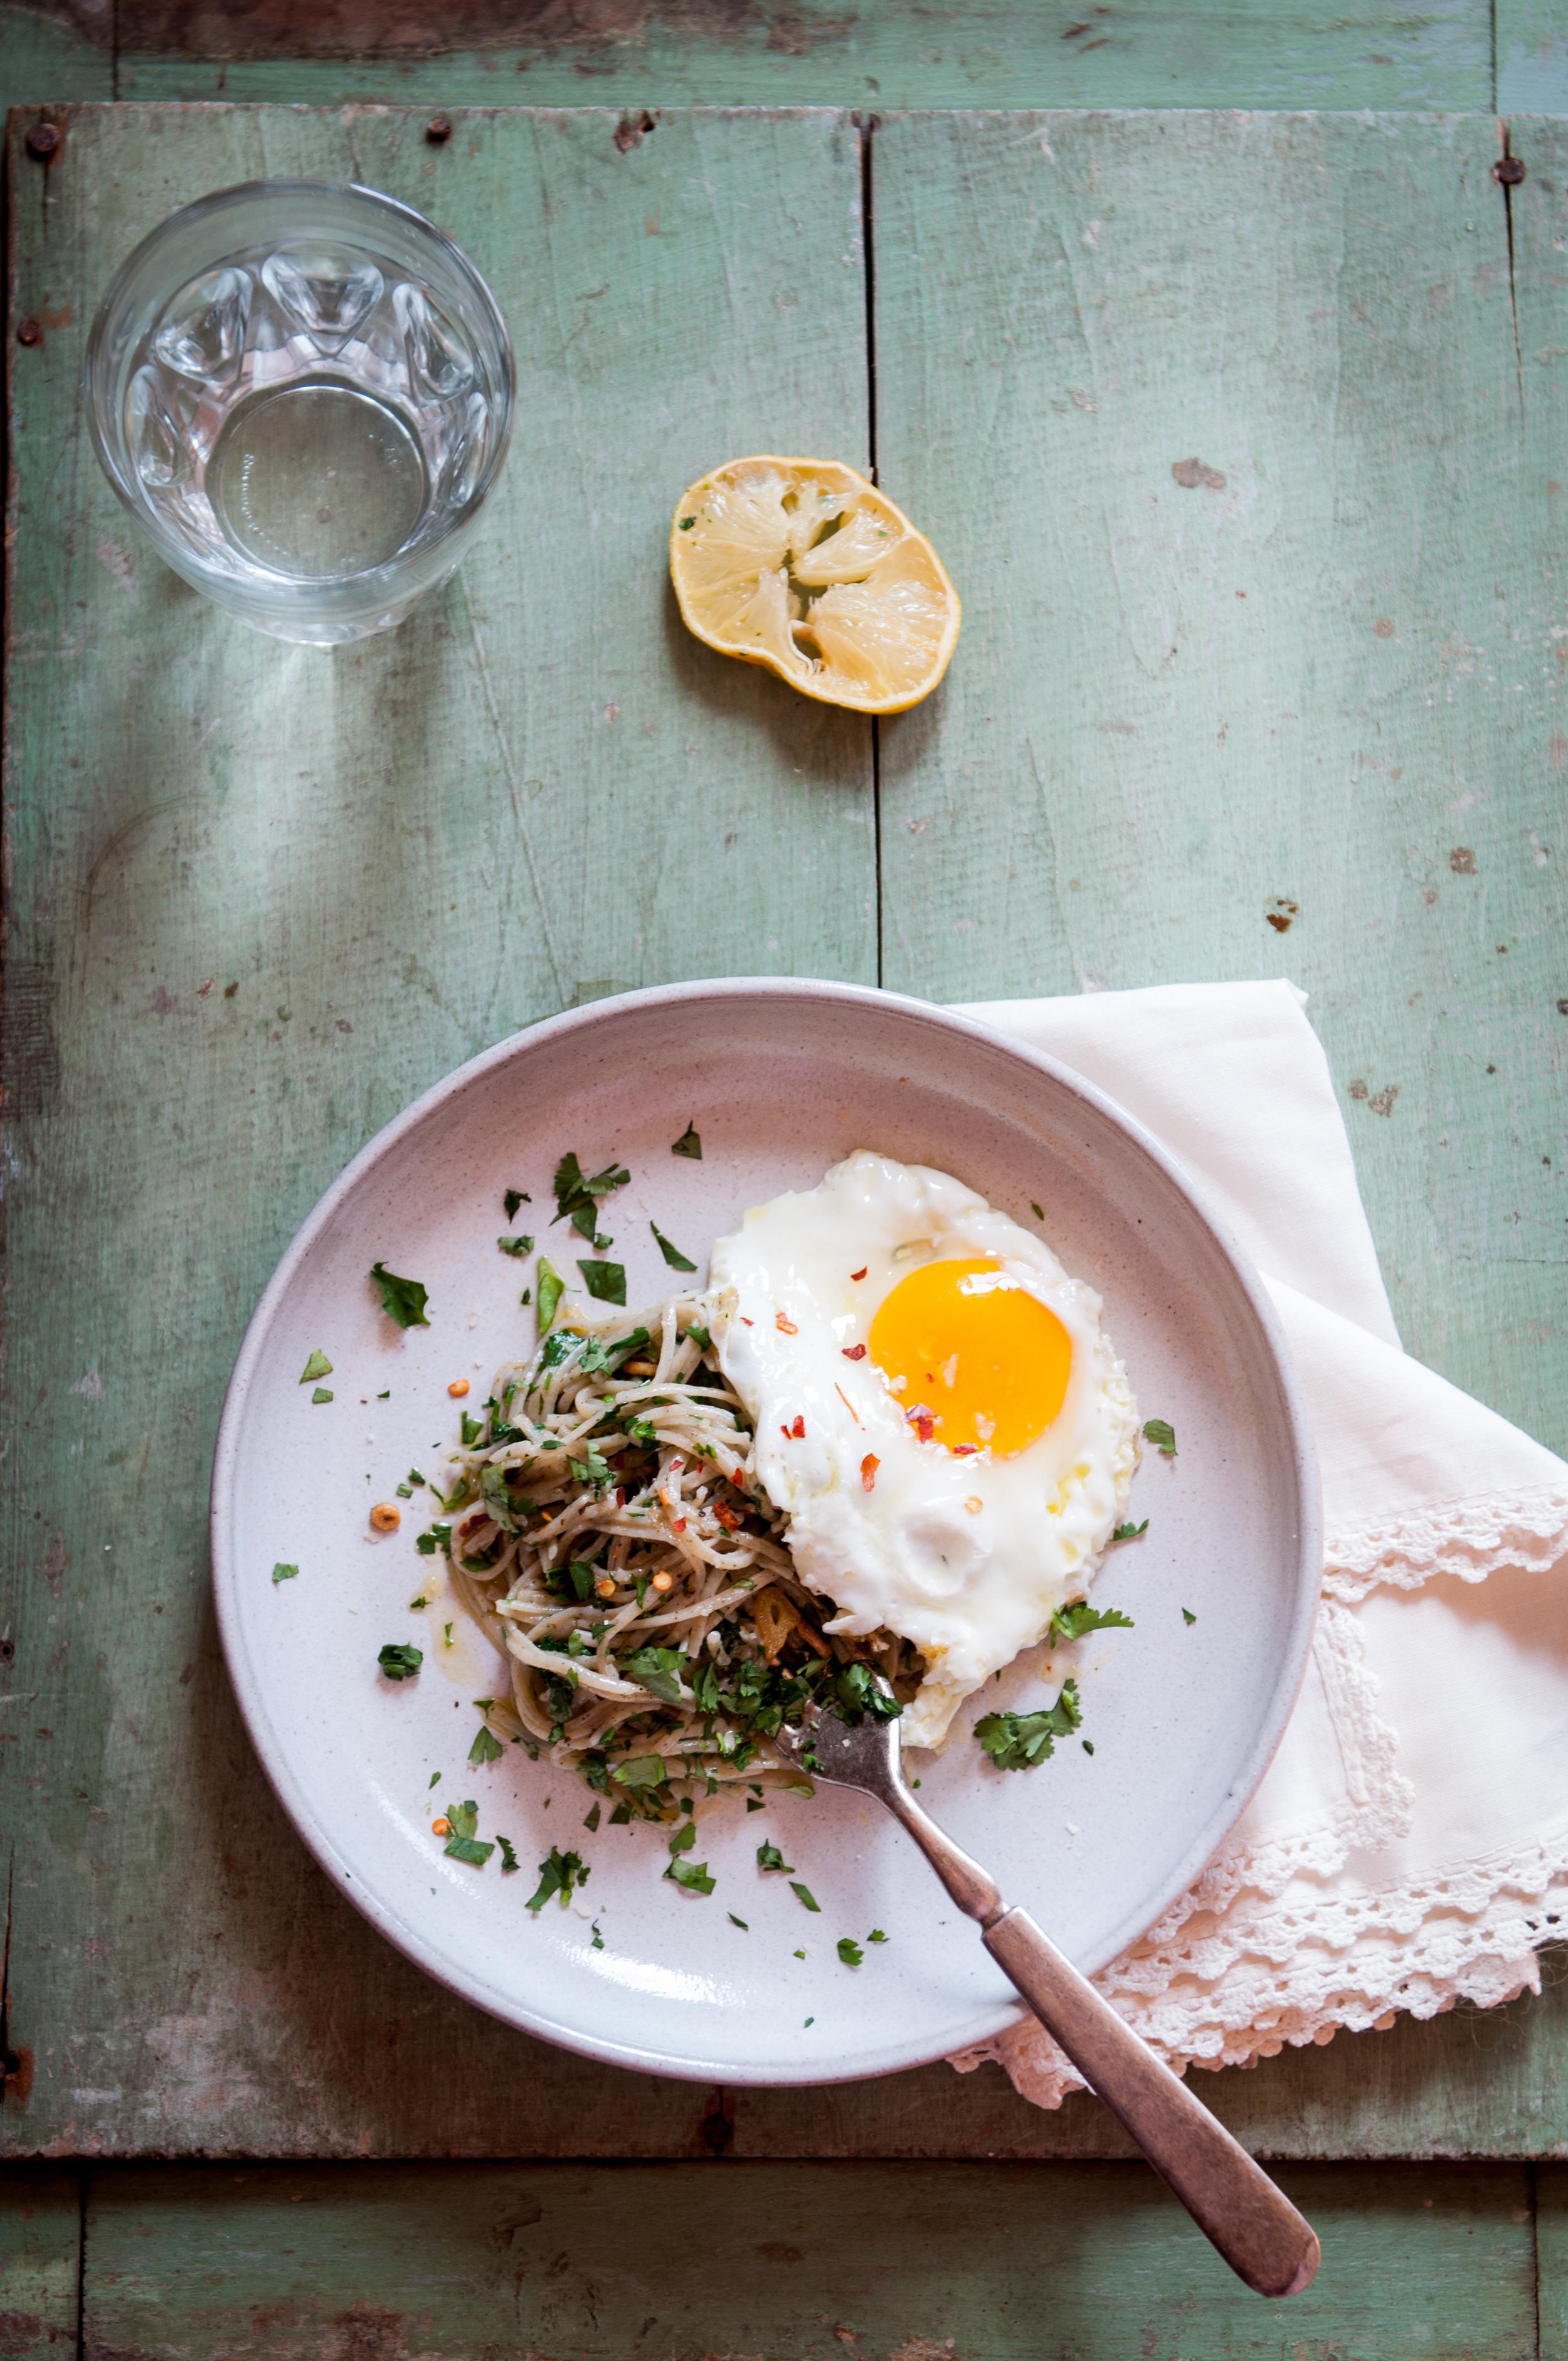 Garlic-Cilantro-Oil-Pasta-with-Fried-egg.jpg